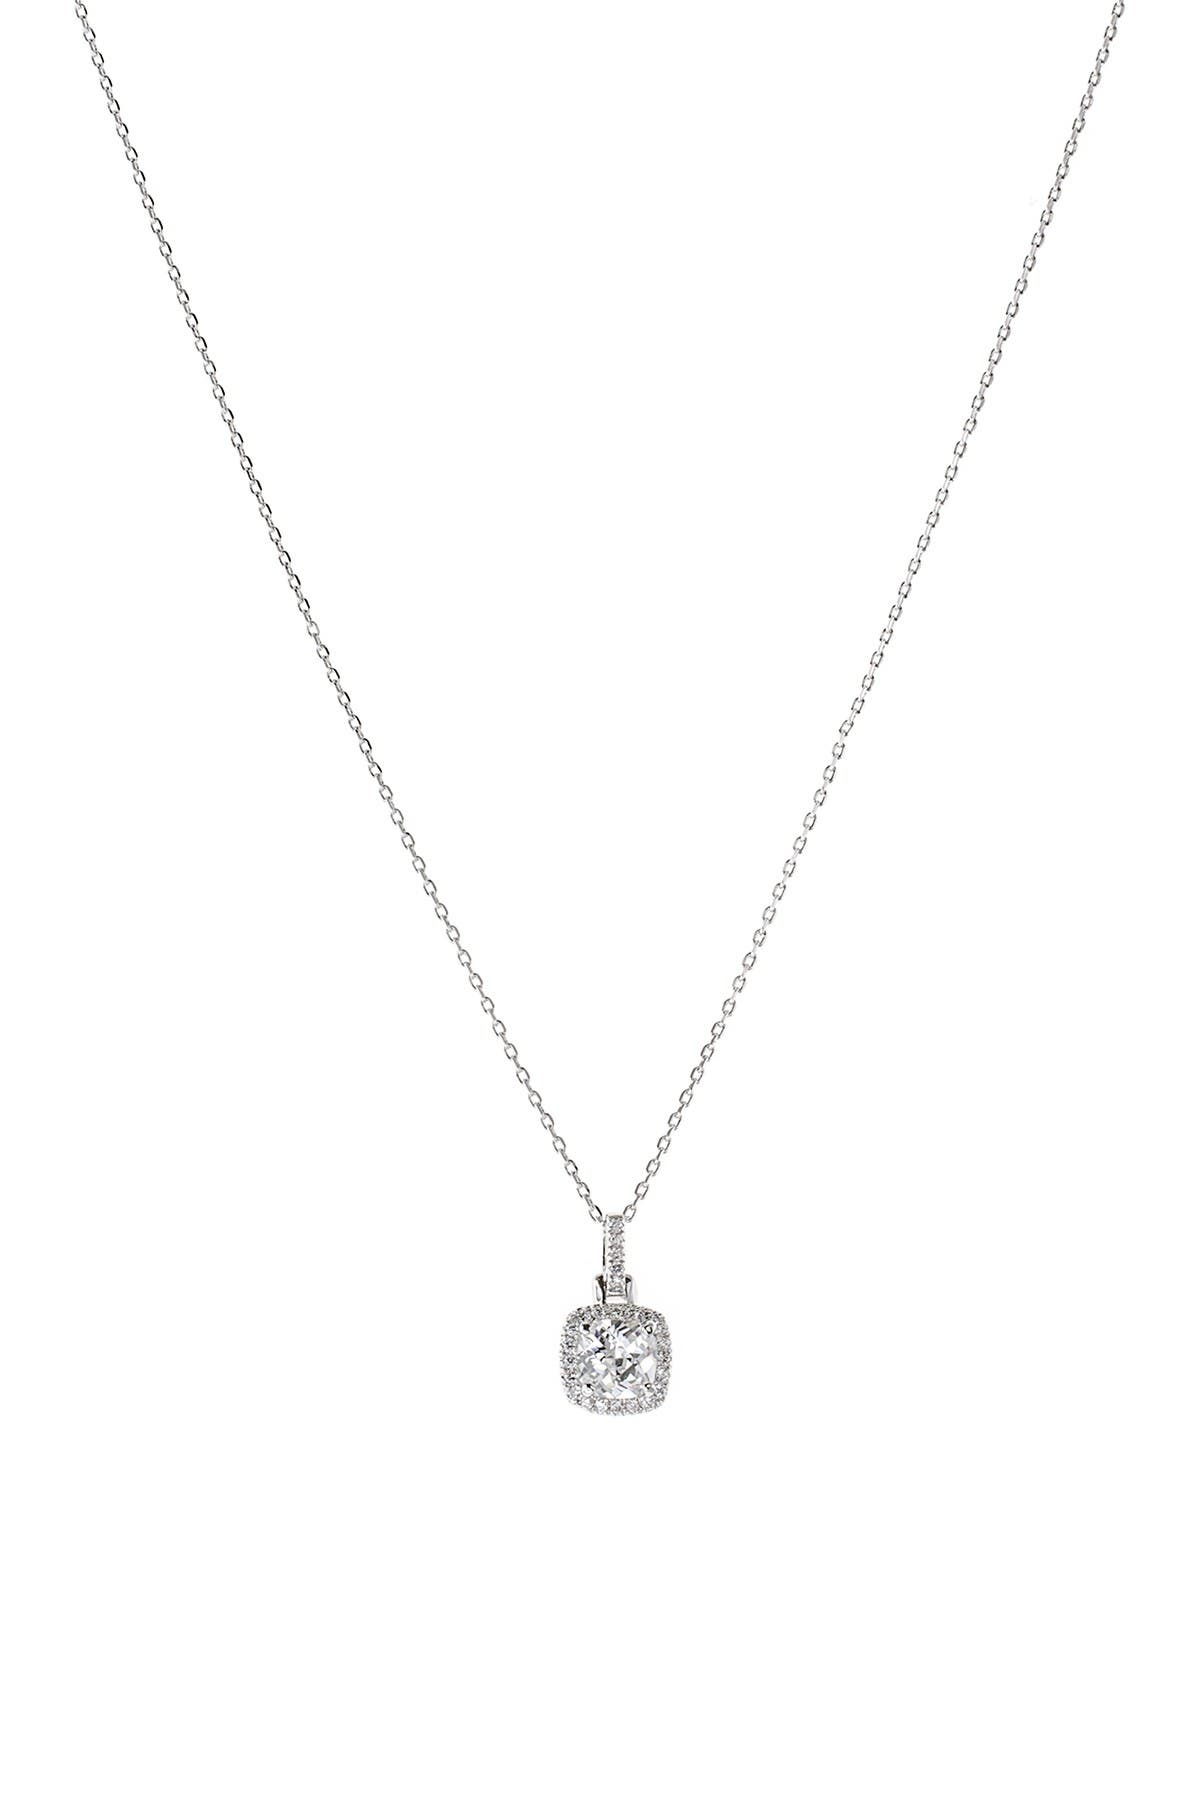 Image of CZ By Kenneth Jay Lane Cushion CZ Pendant Necklace